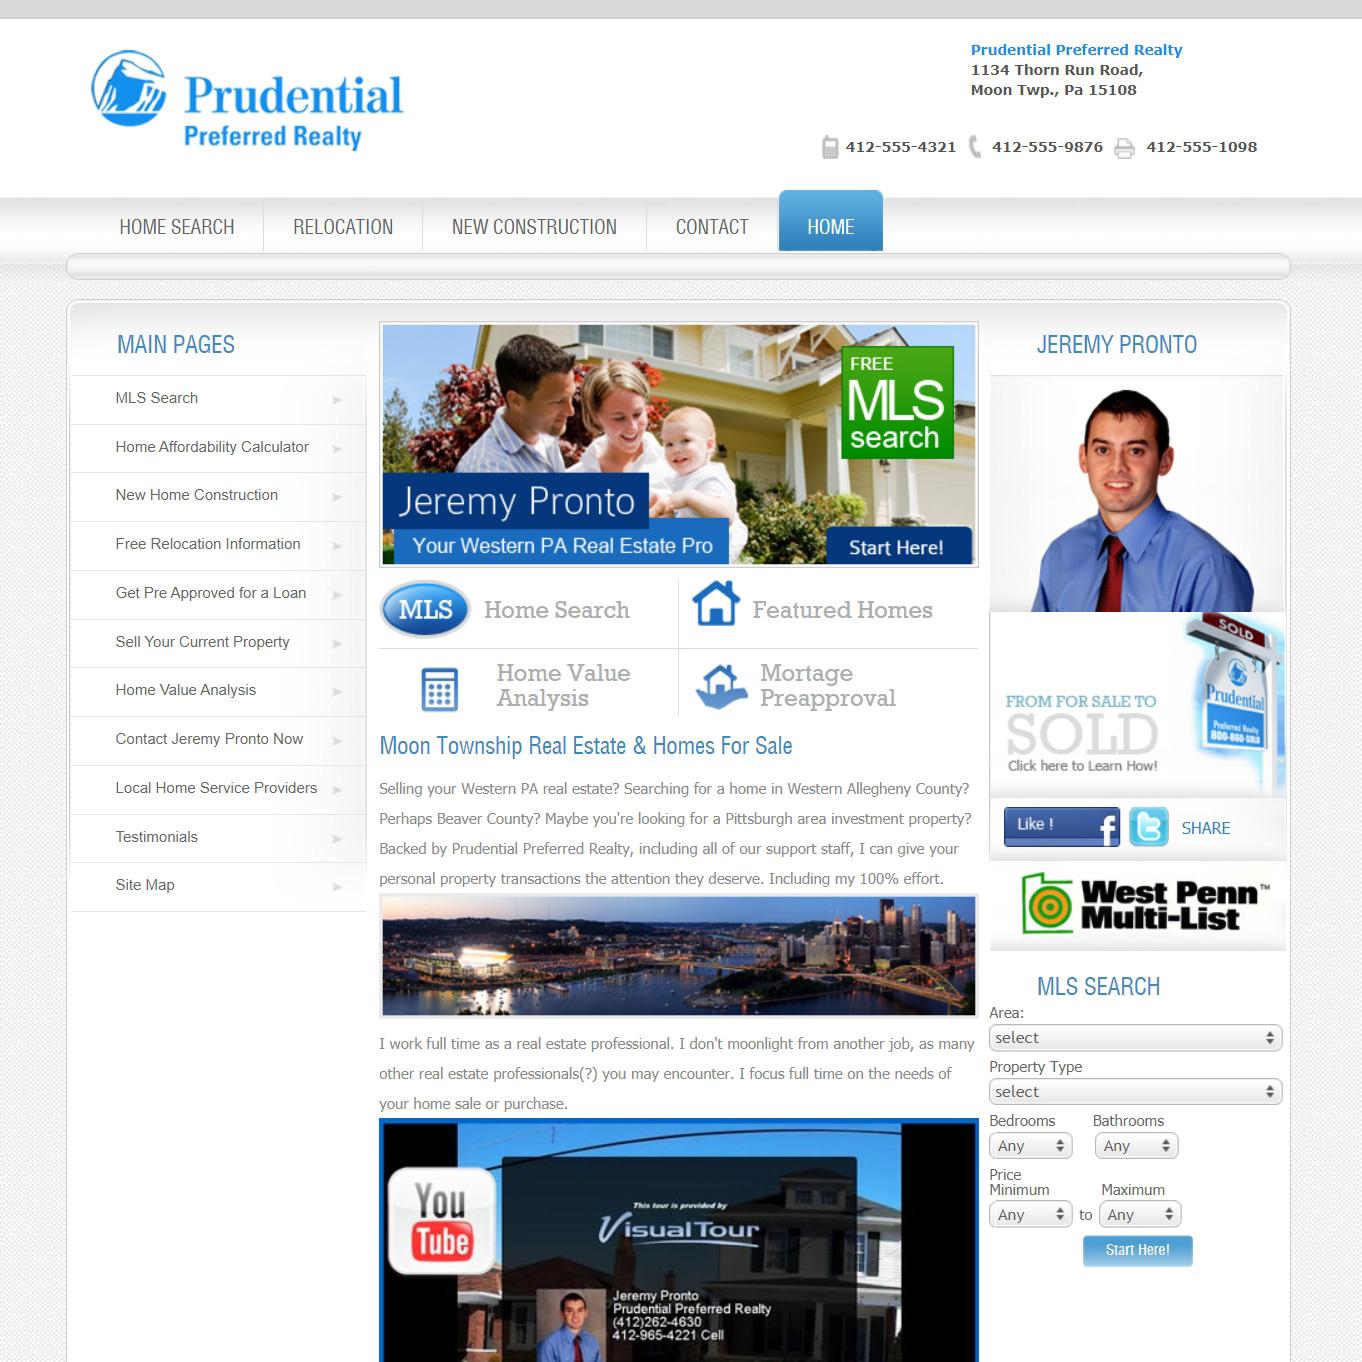 Prudential Preferred Realty - real estate website design